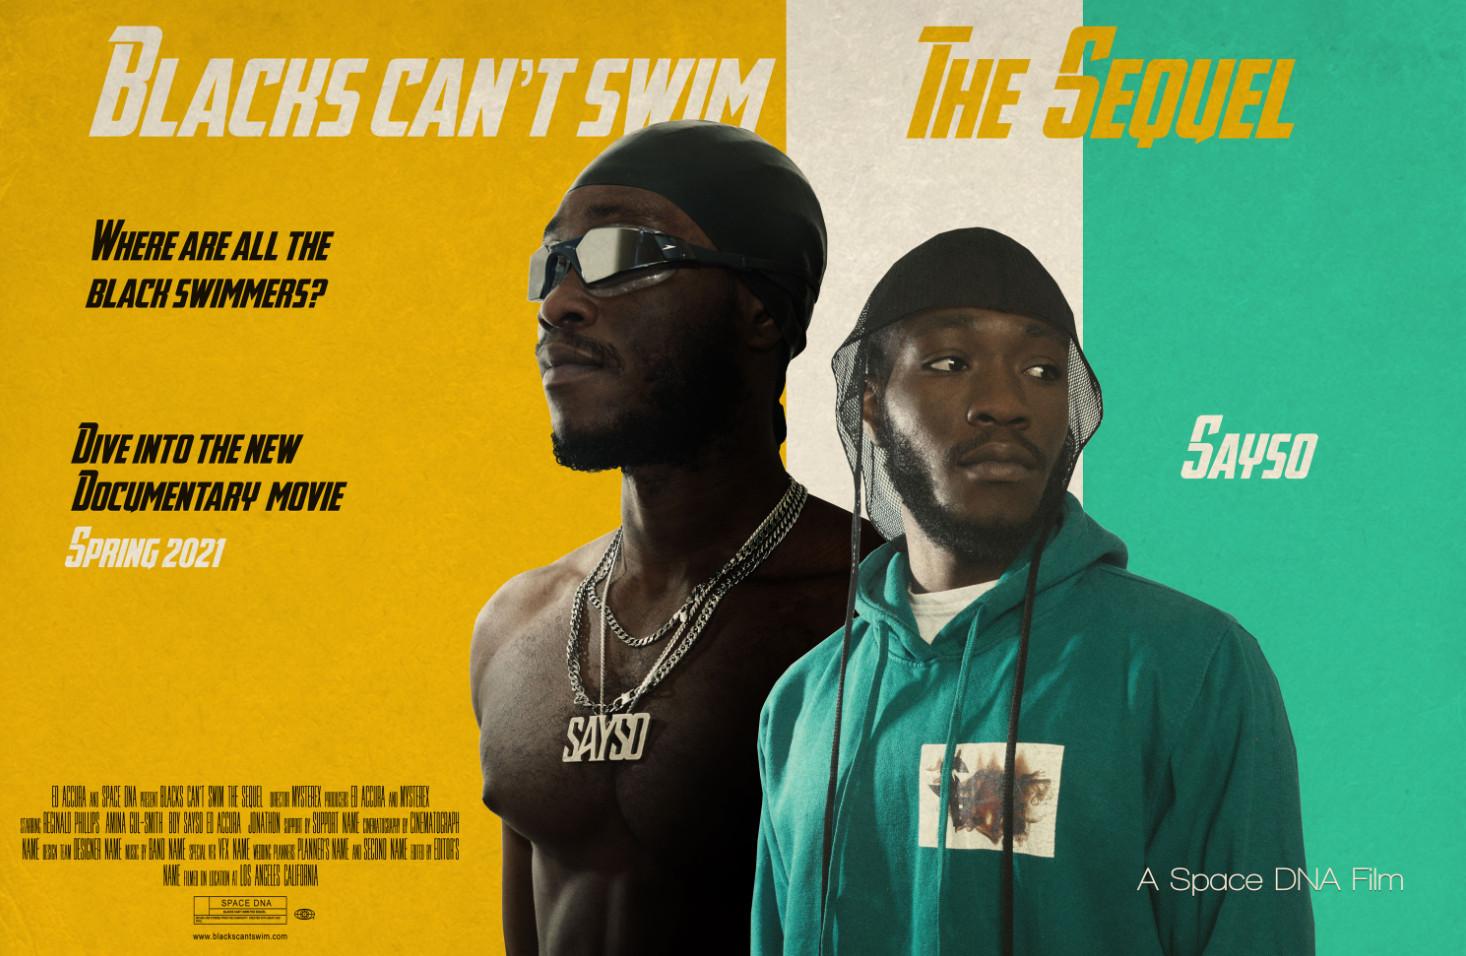 Blacks can't swim the sequel